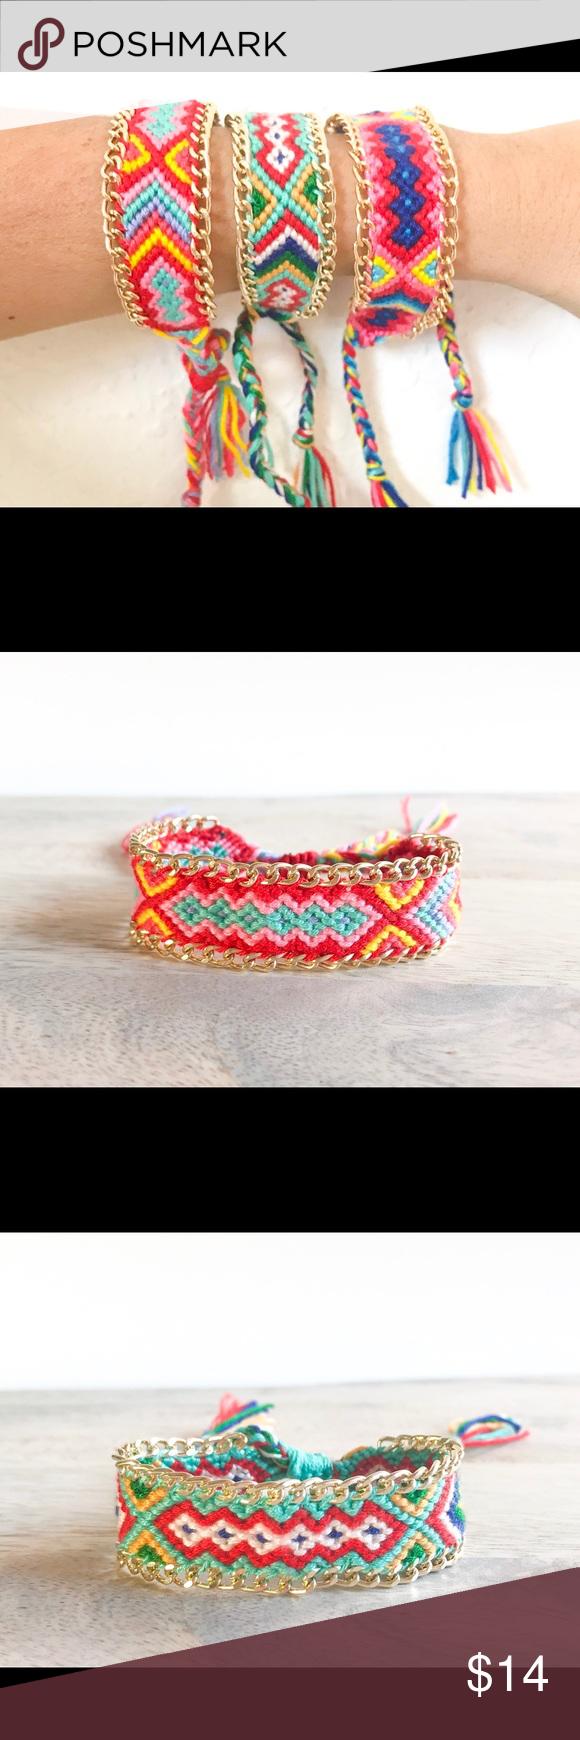 Handmade boho friendship bracelets boutique pinterest friendship